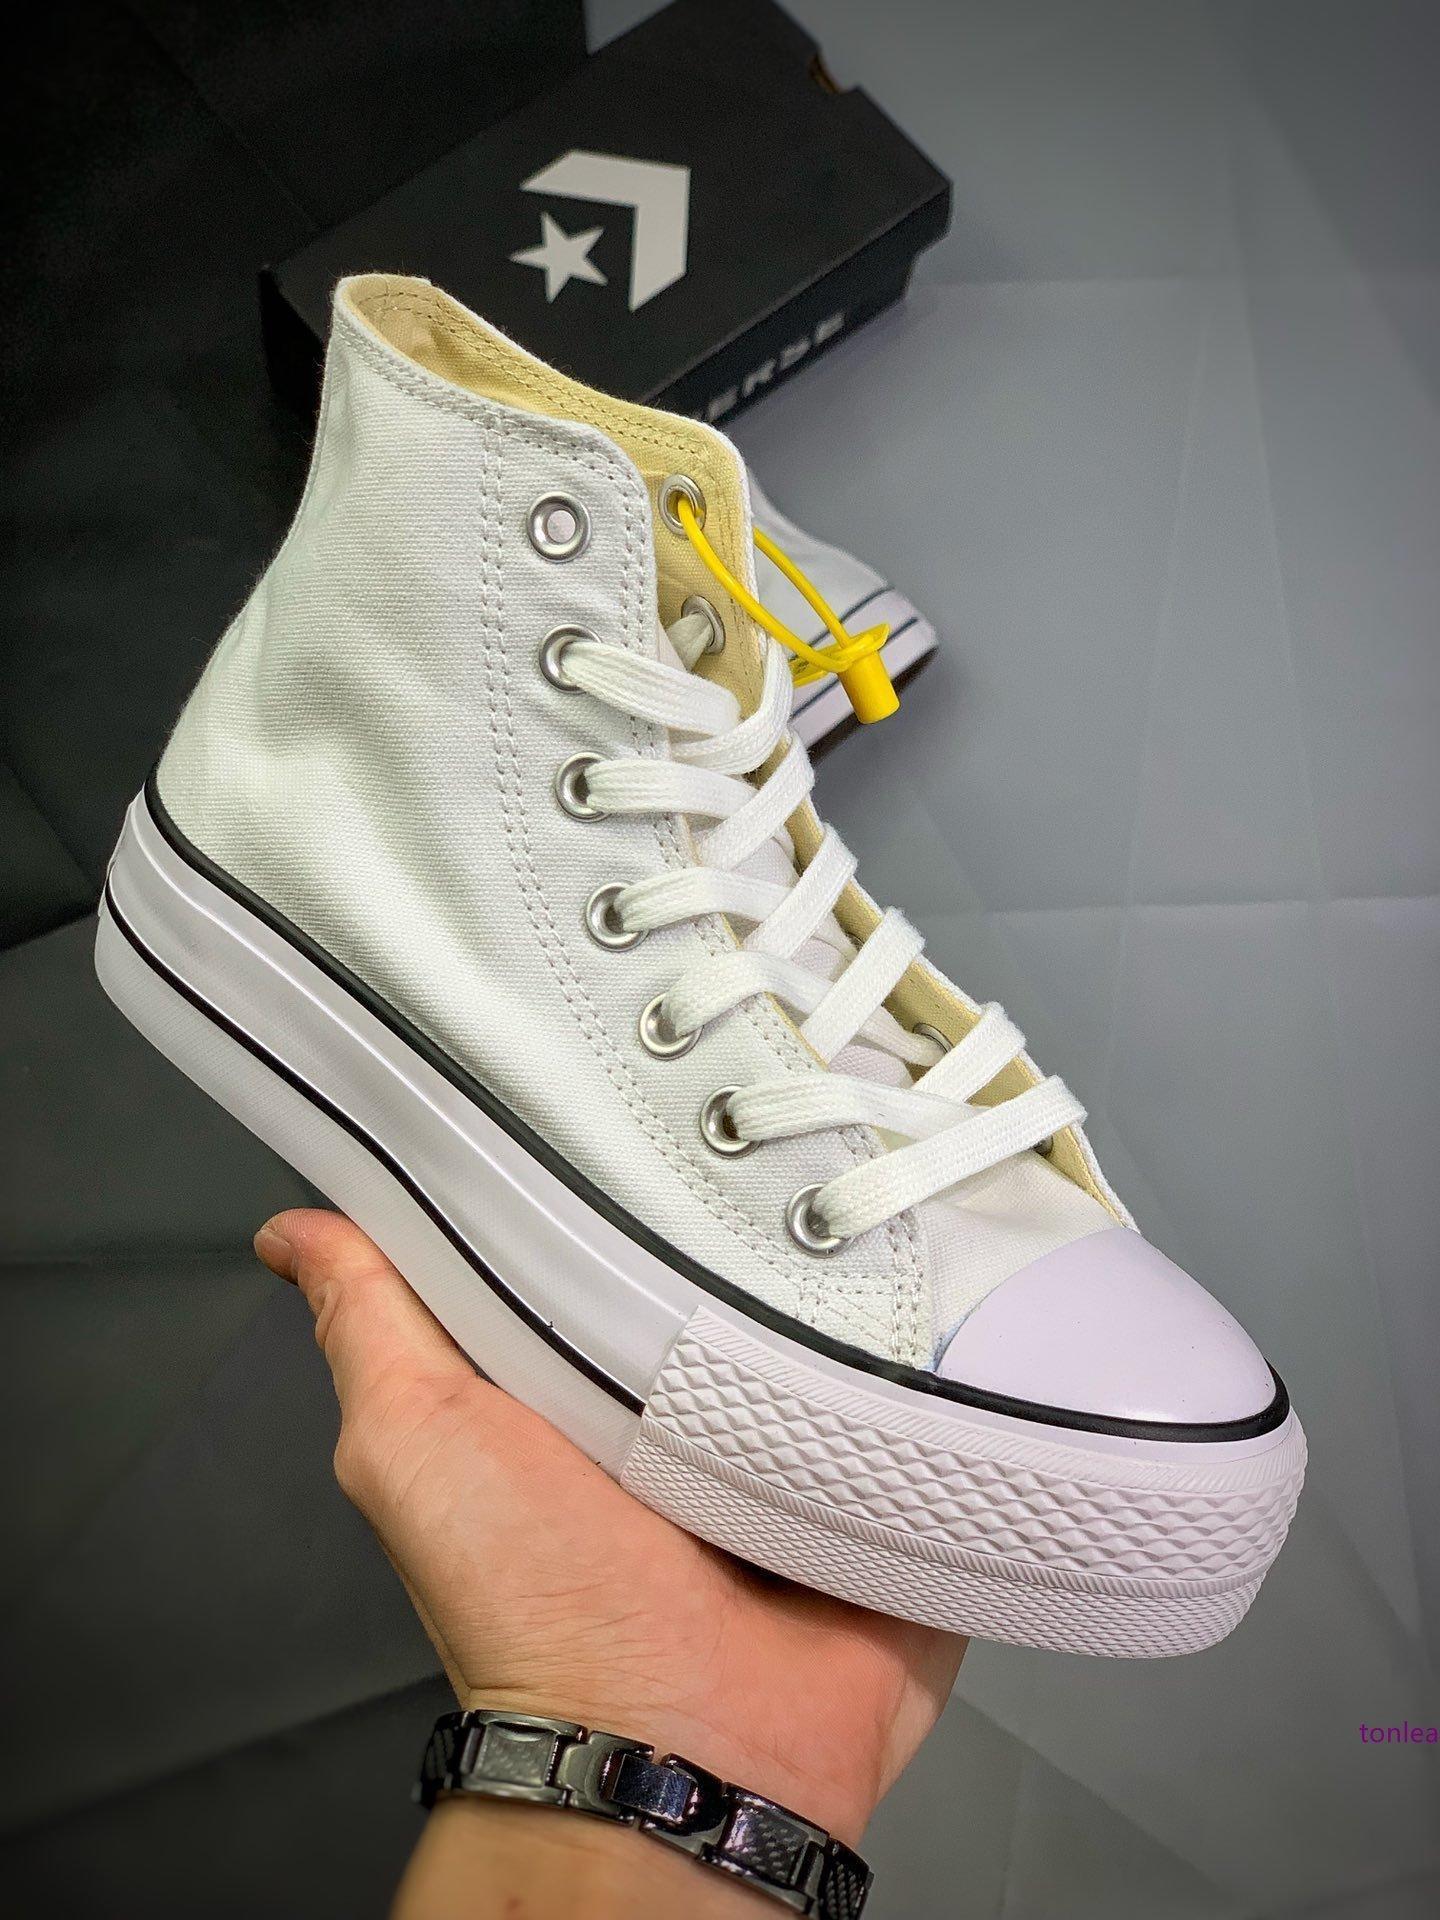 2020 Nova Chuck 10 preto Hi Plataforma Running Shoes Taylor 10S Canvas Homens Mulheres Sapatos Moda plimsolls brancos Chaussures Casual